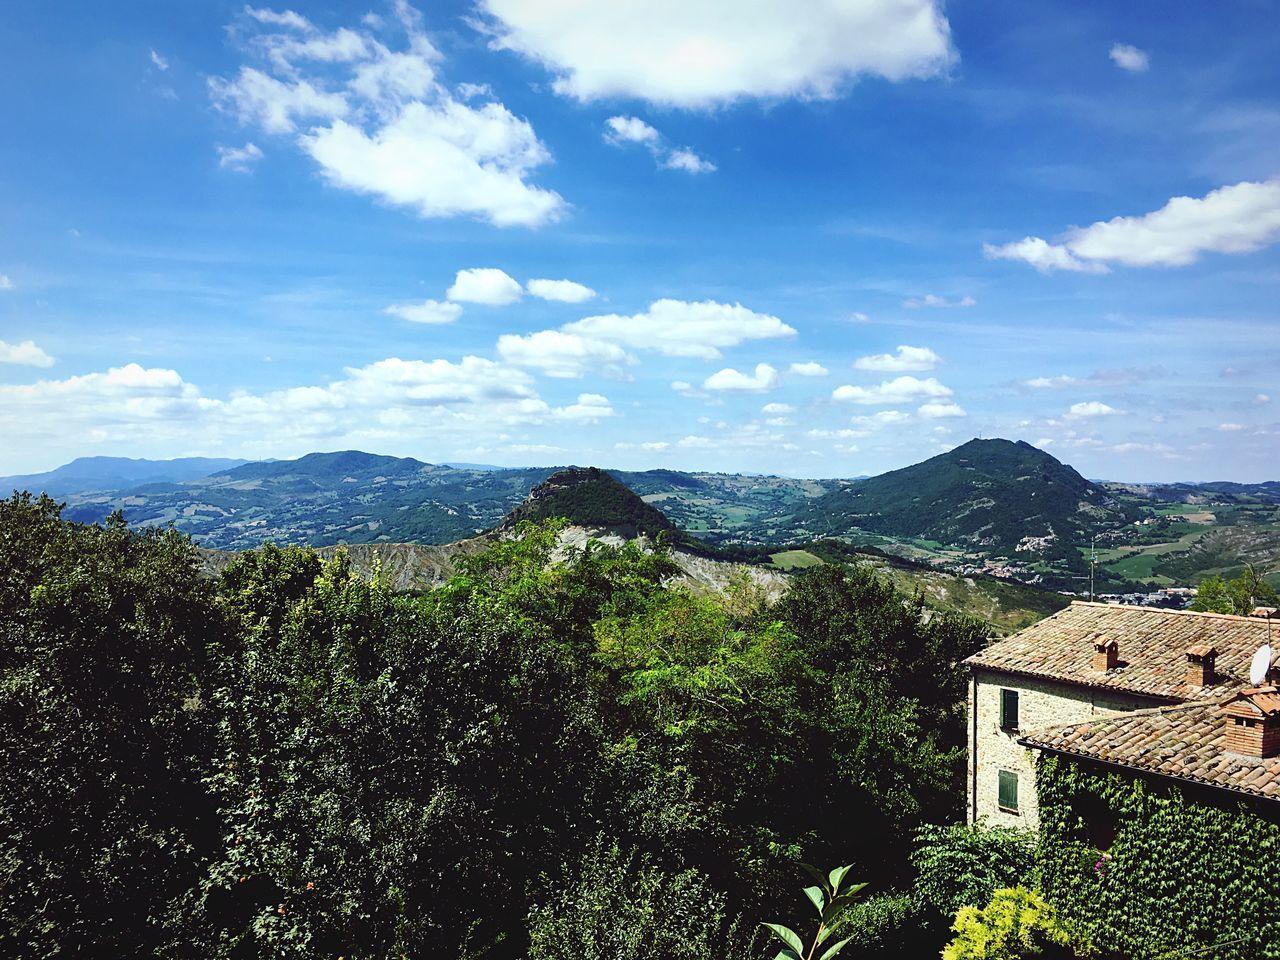 Emiliaromagna Sanleo Montefeltro Landscape Scenics Taking Photos Outdoors Relaxing